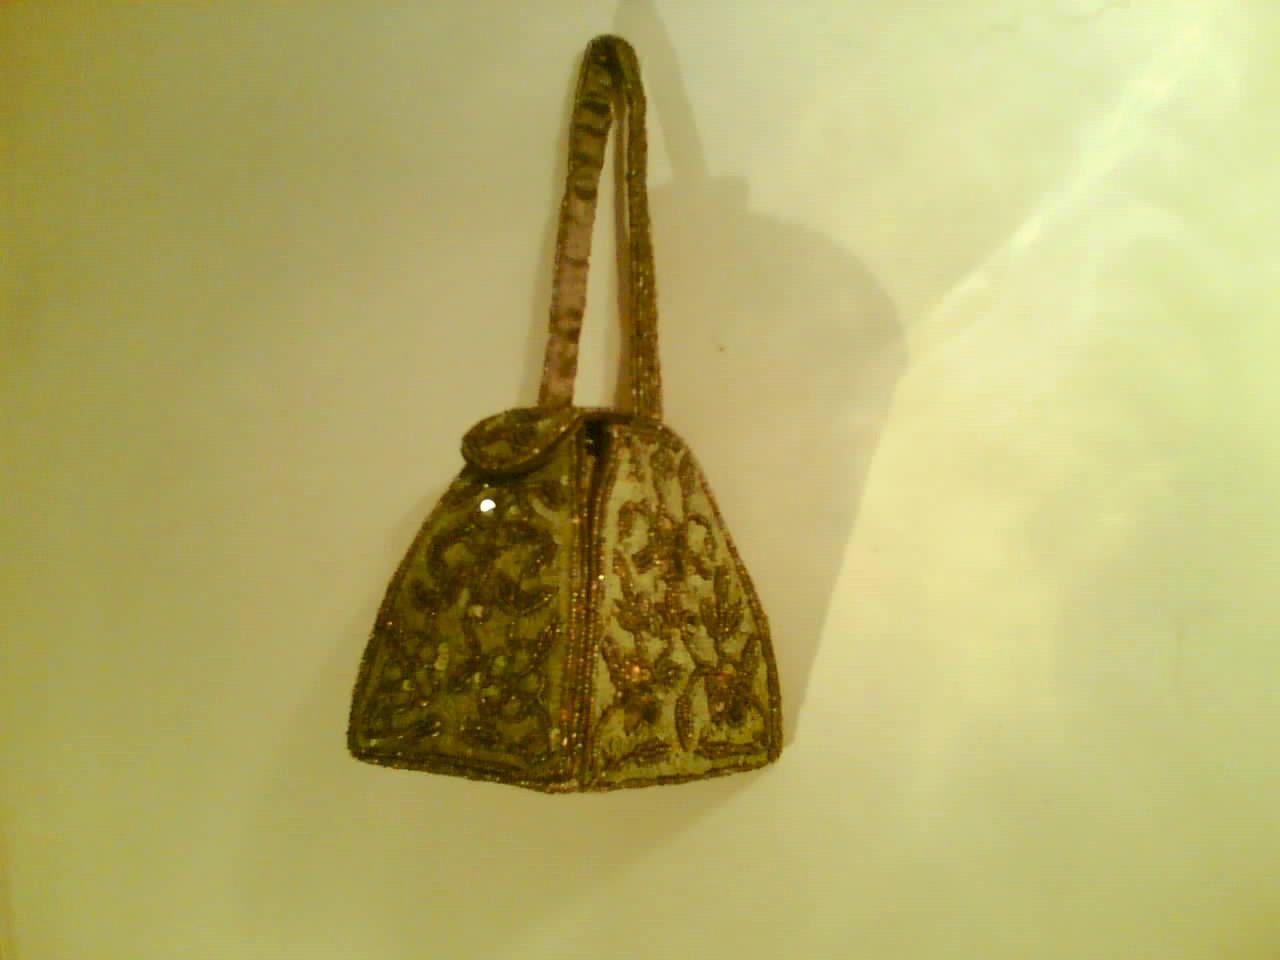 Fashion Bag, Bangles, Accessories (Мода сумки, браслеты, аксессуары)